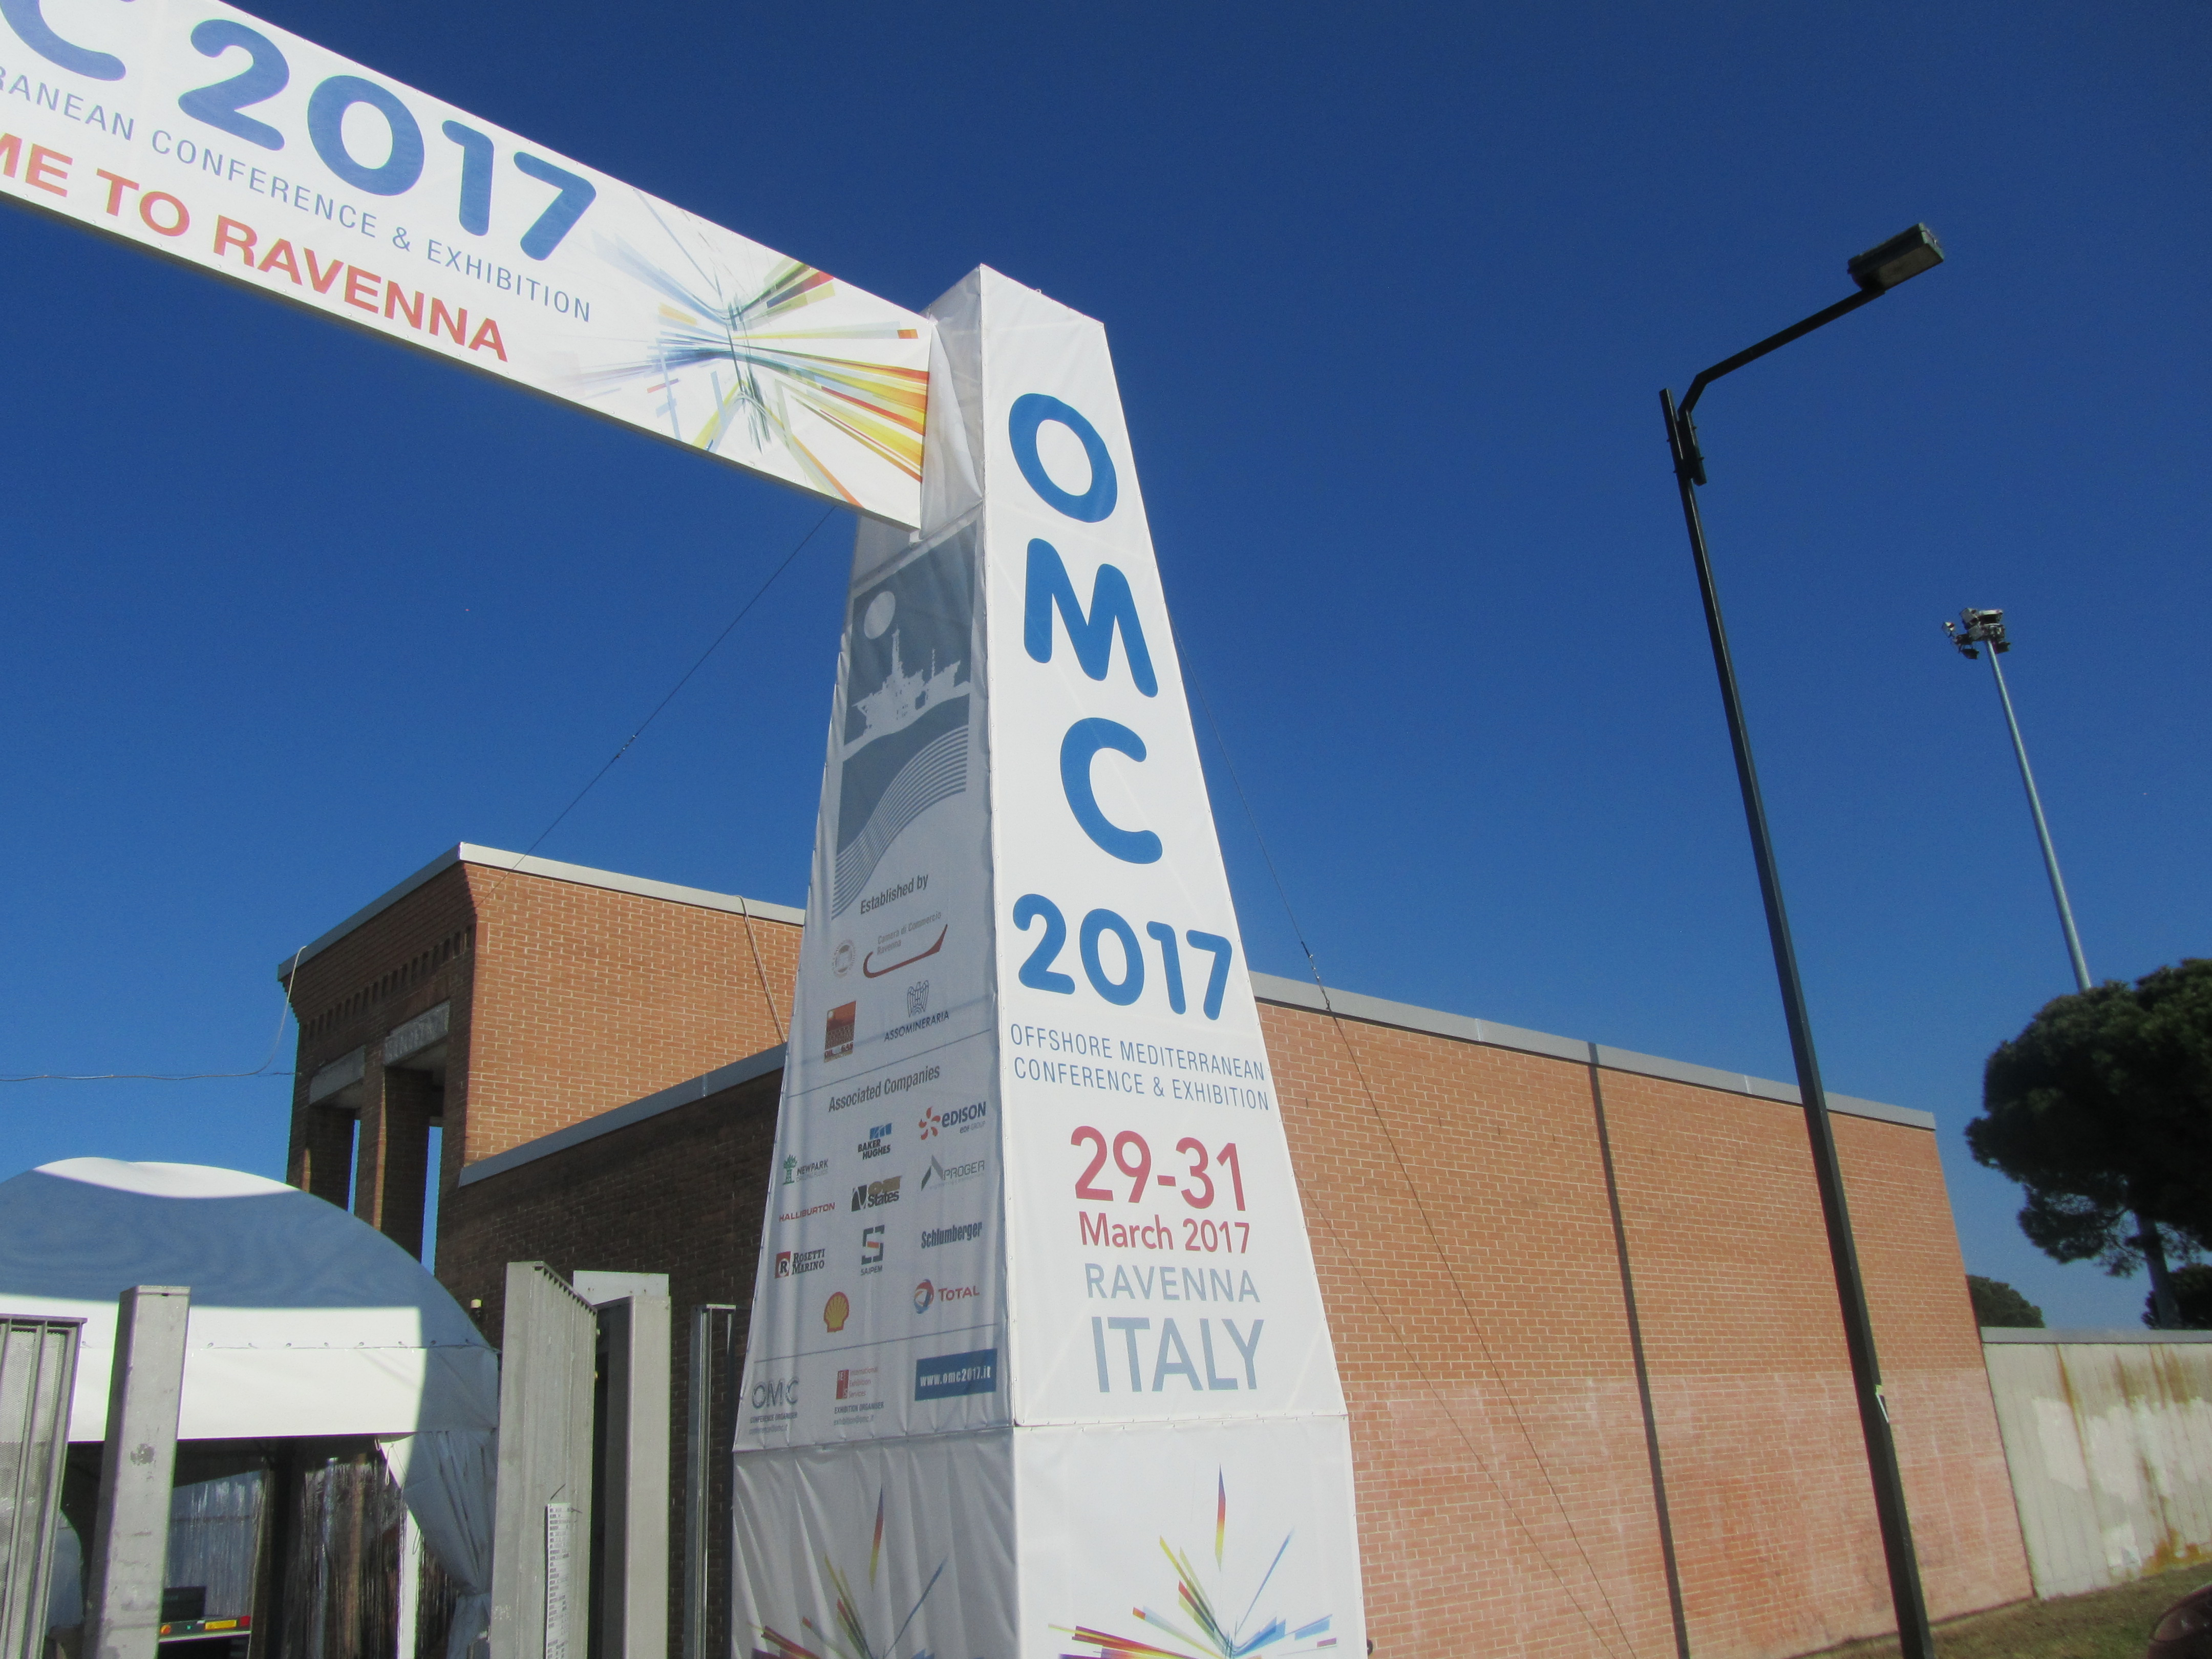 SI APRE A RAVENNA L'OMC 2017 - Perforare -  - Uncategorized